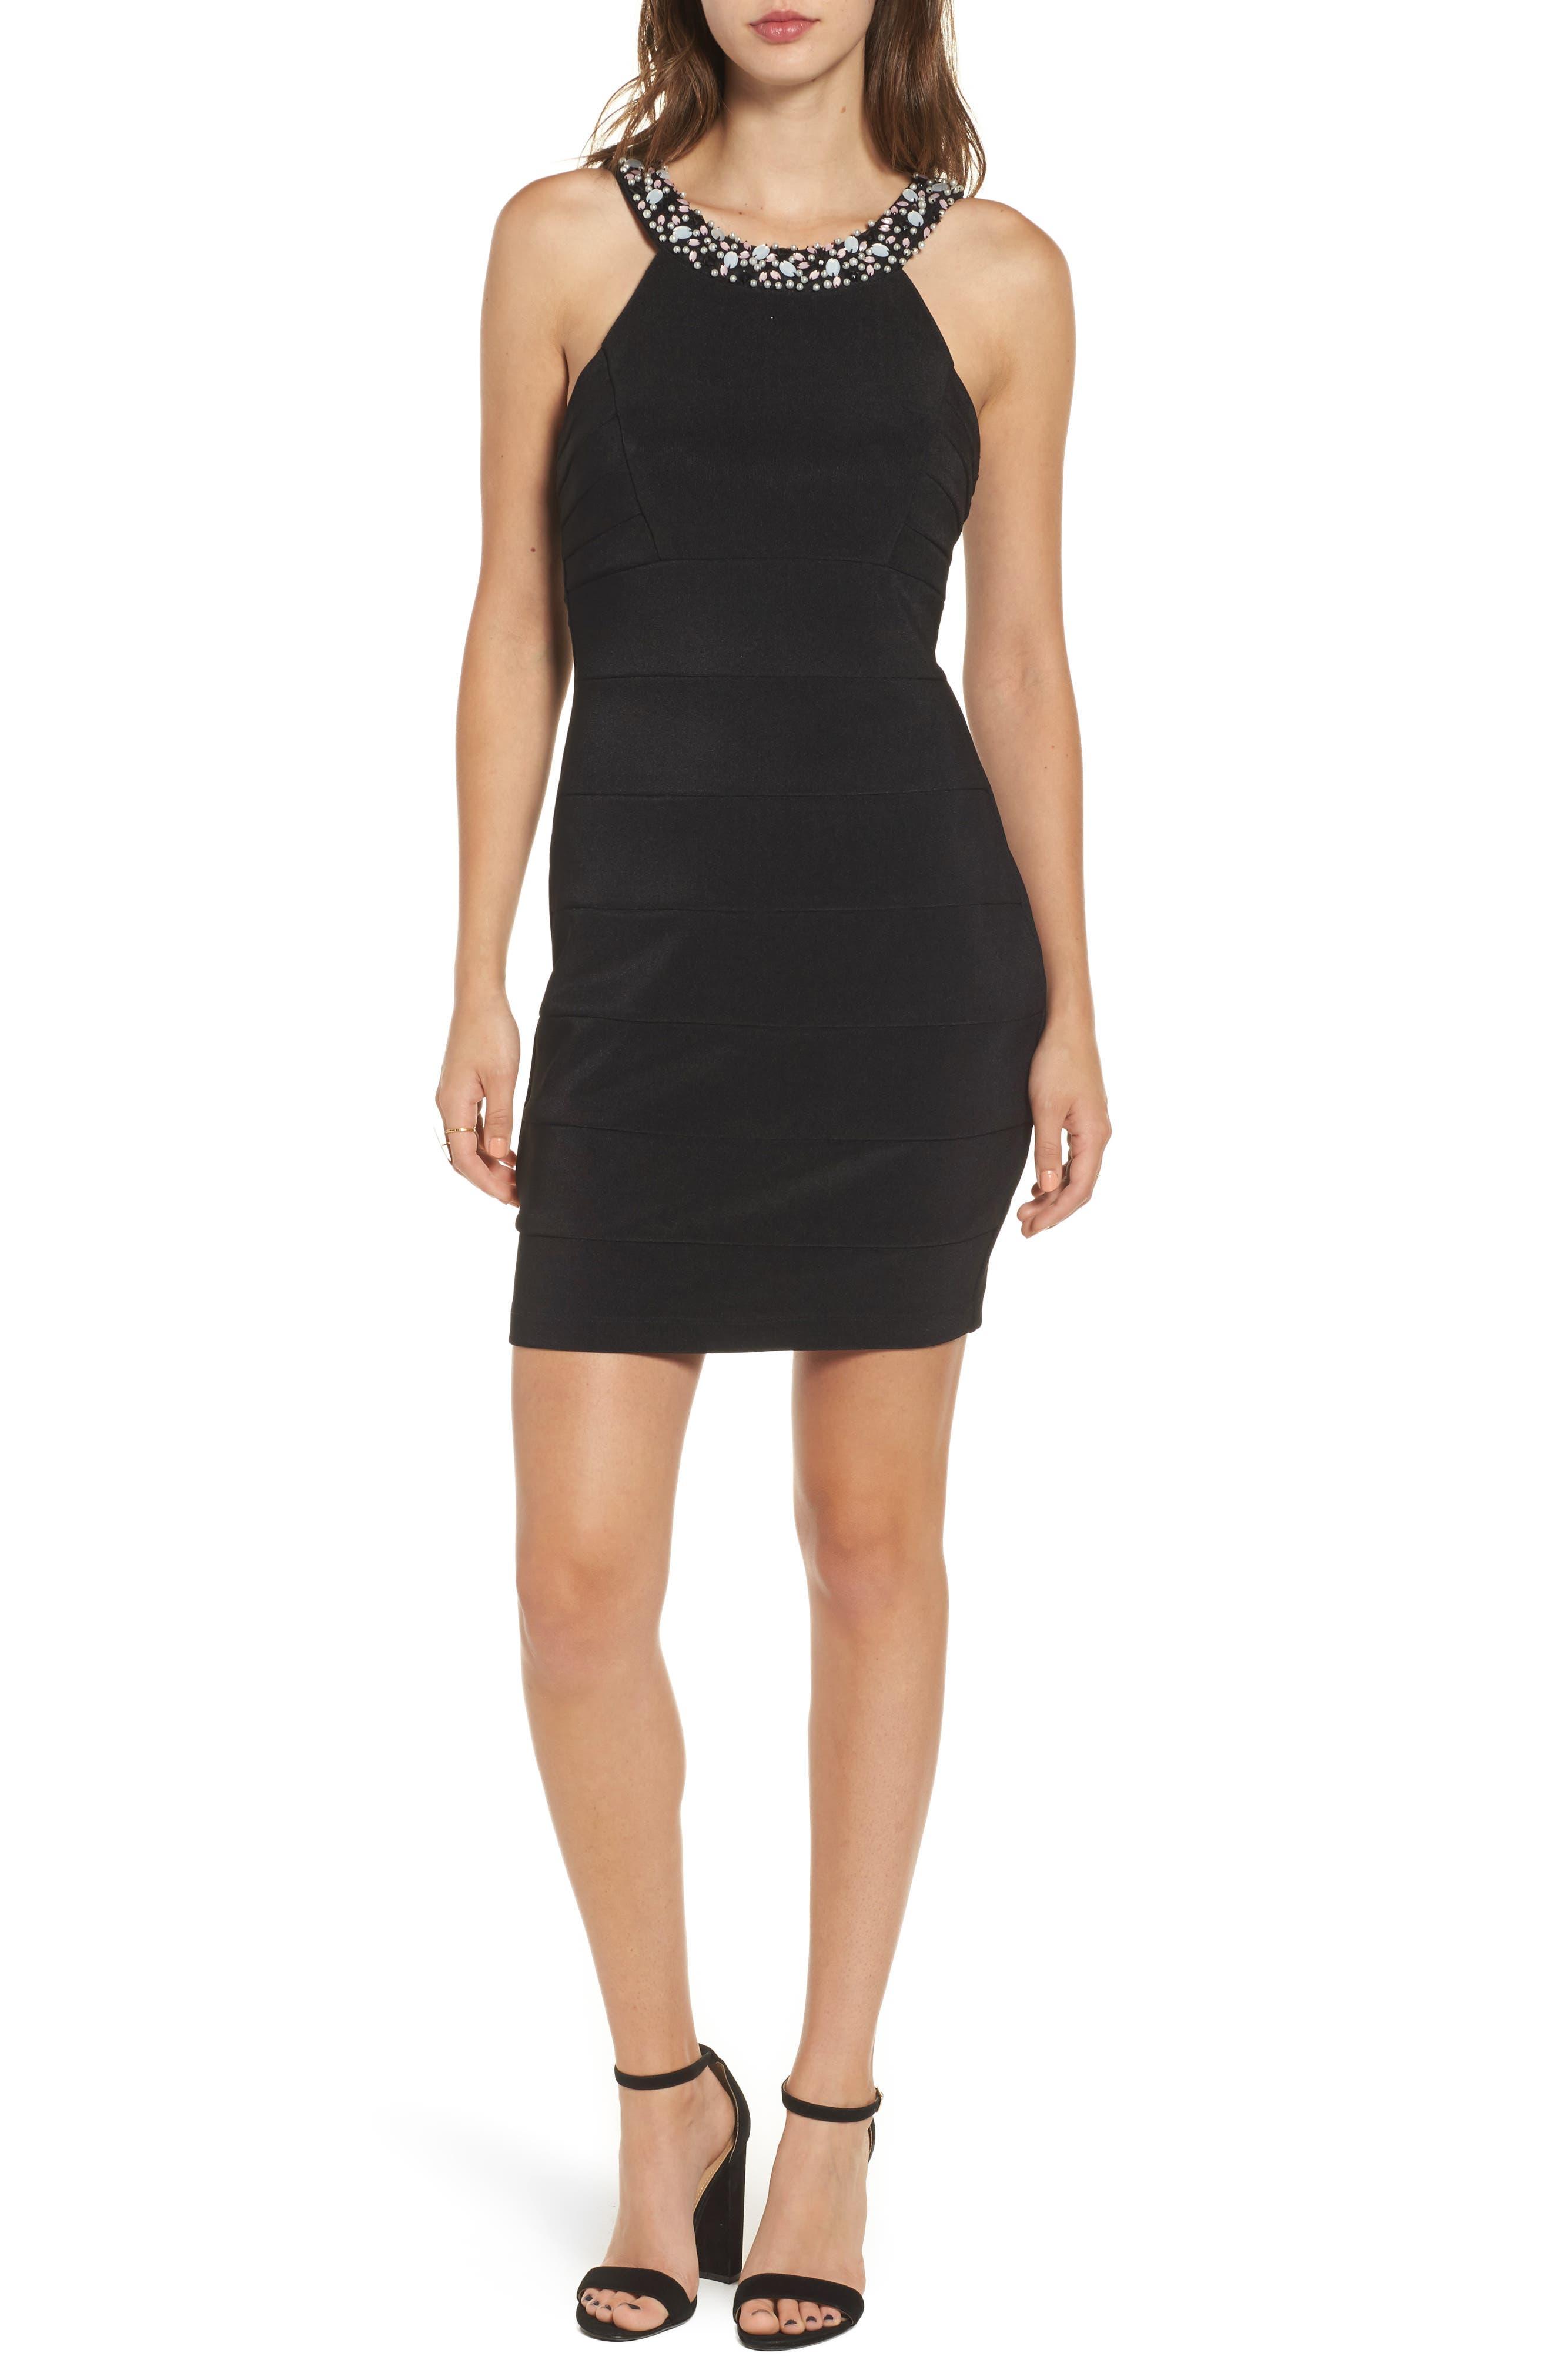 LOVE, NICKIE LEW Love Nickie Lew Beaded Body Con Dress